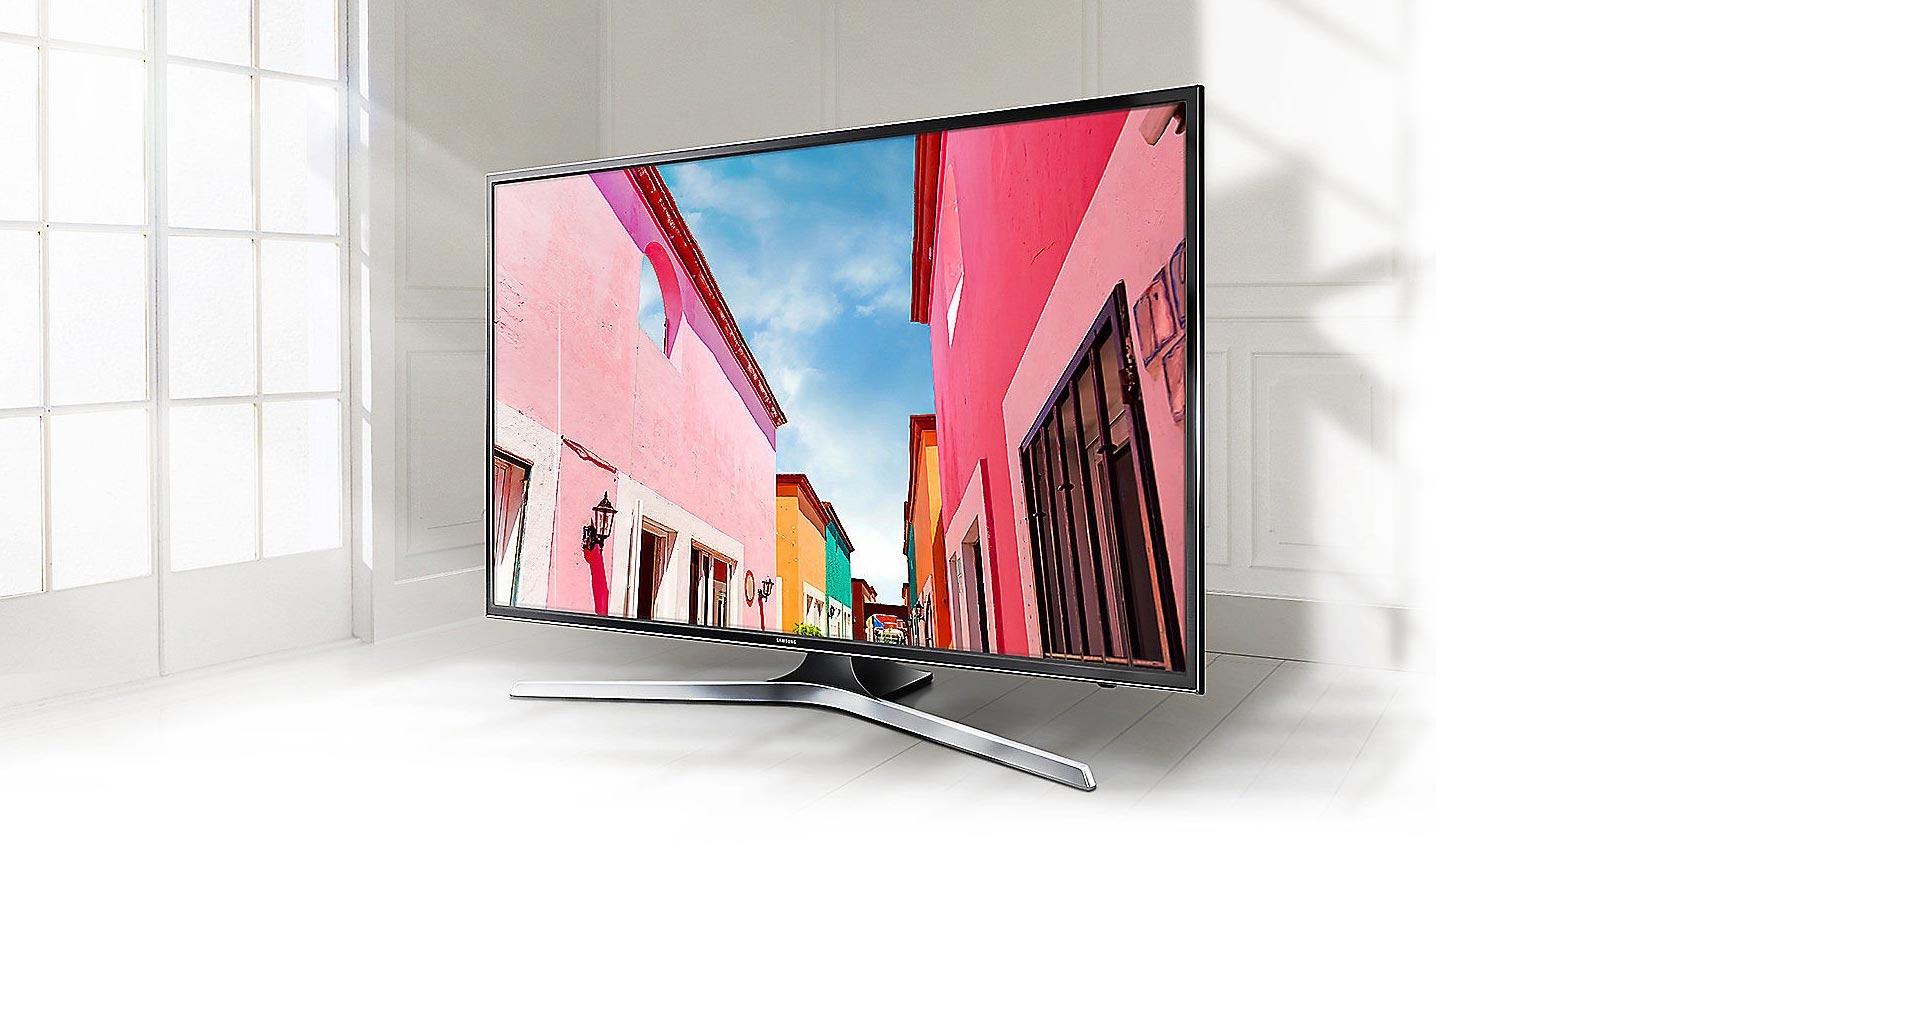 تلویزیون هوشمند سری 7 سامسونگ با کیفیت 4K UHD واقعی